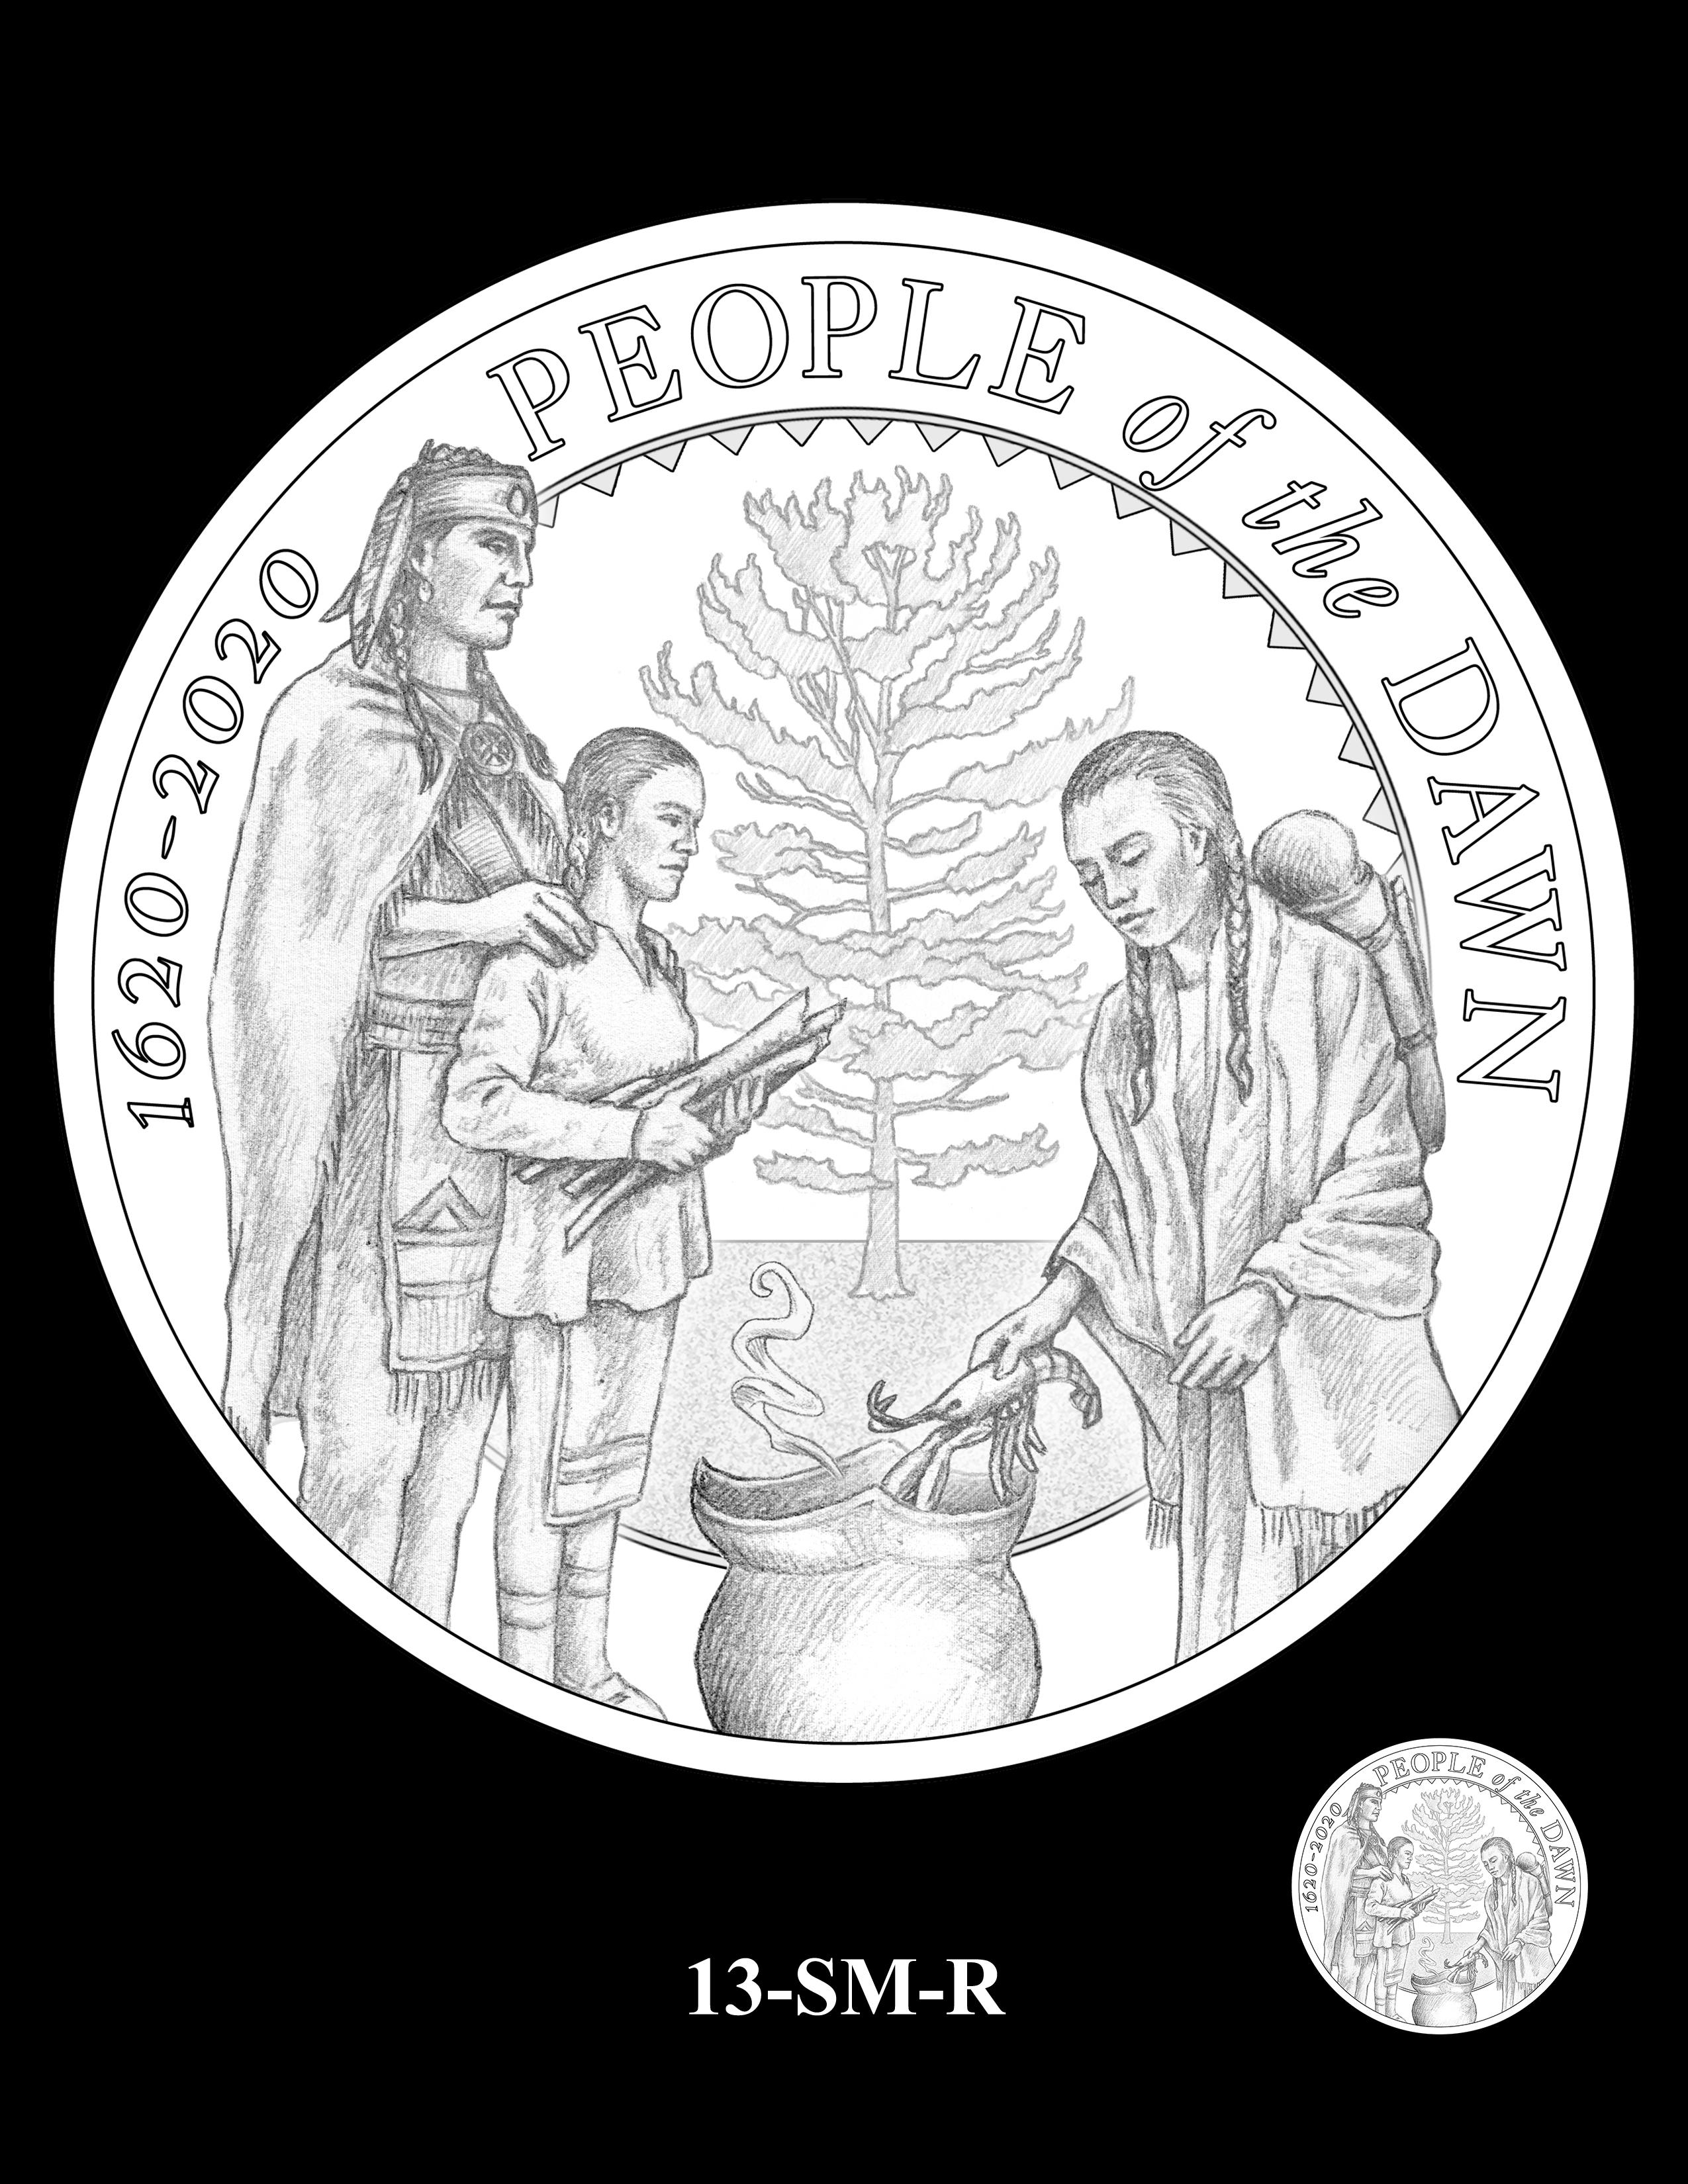 13-SM-R - 2020 Mayflower 400th Anniversary 24K Gold Coin & Silver Medal Program